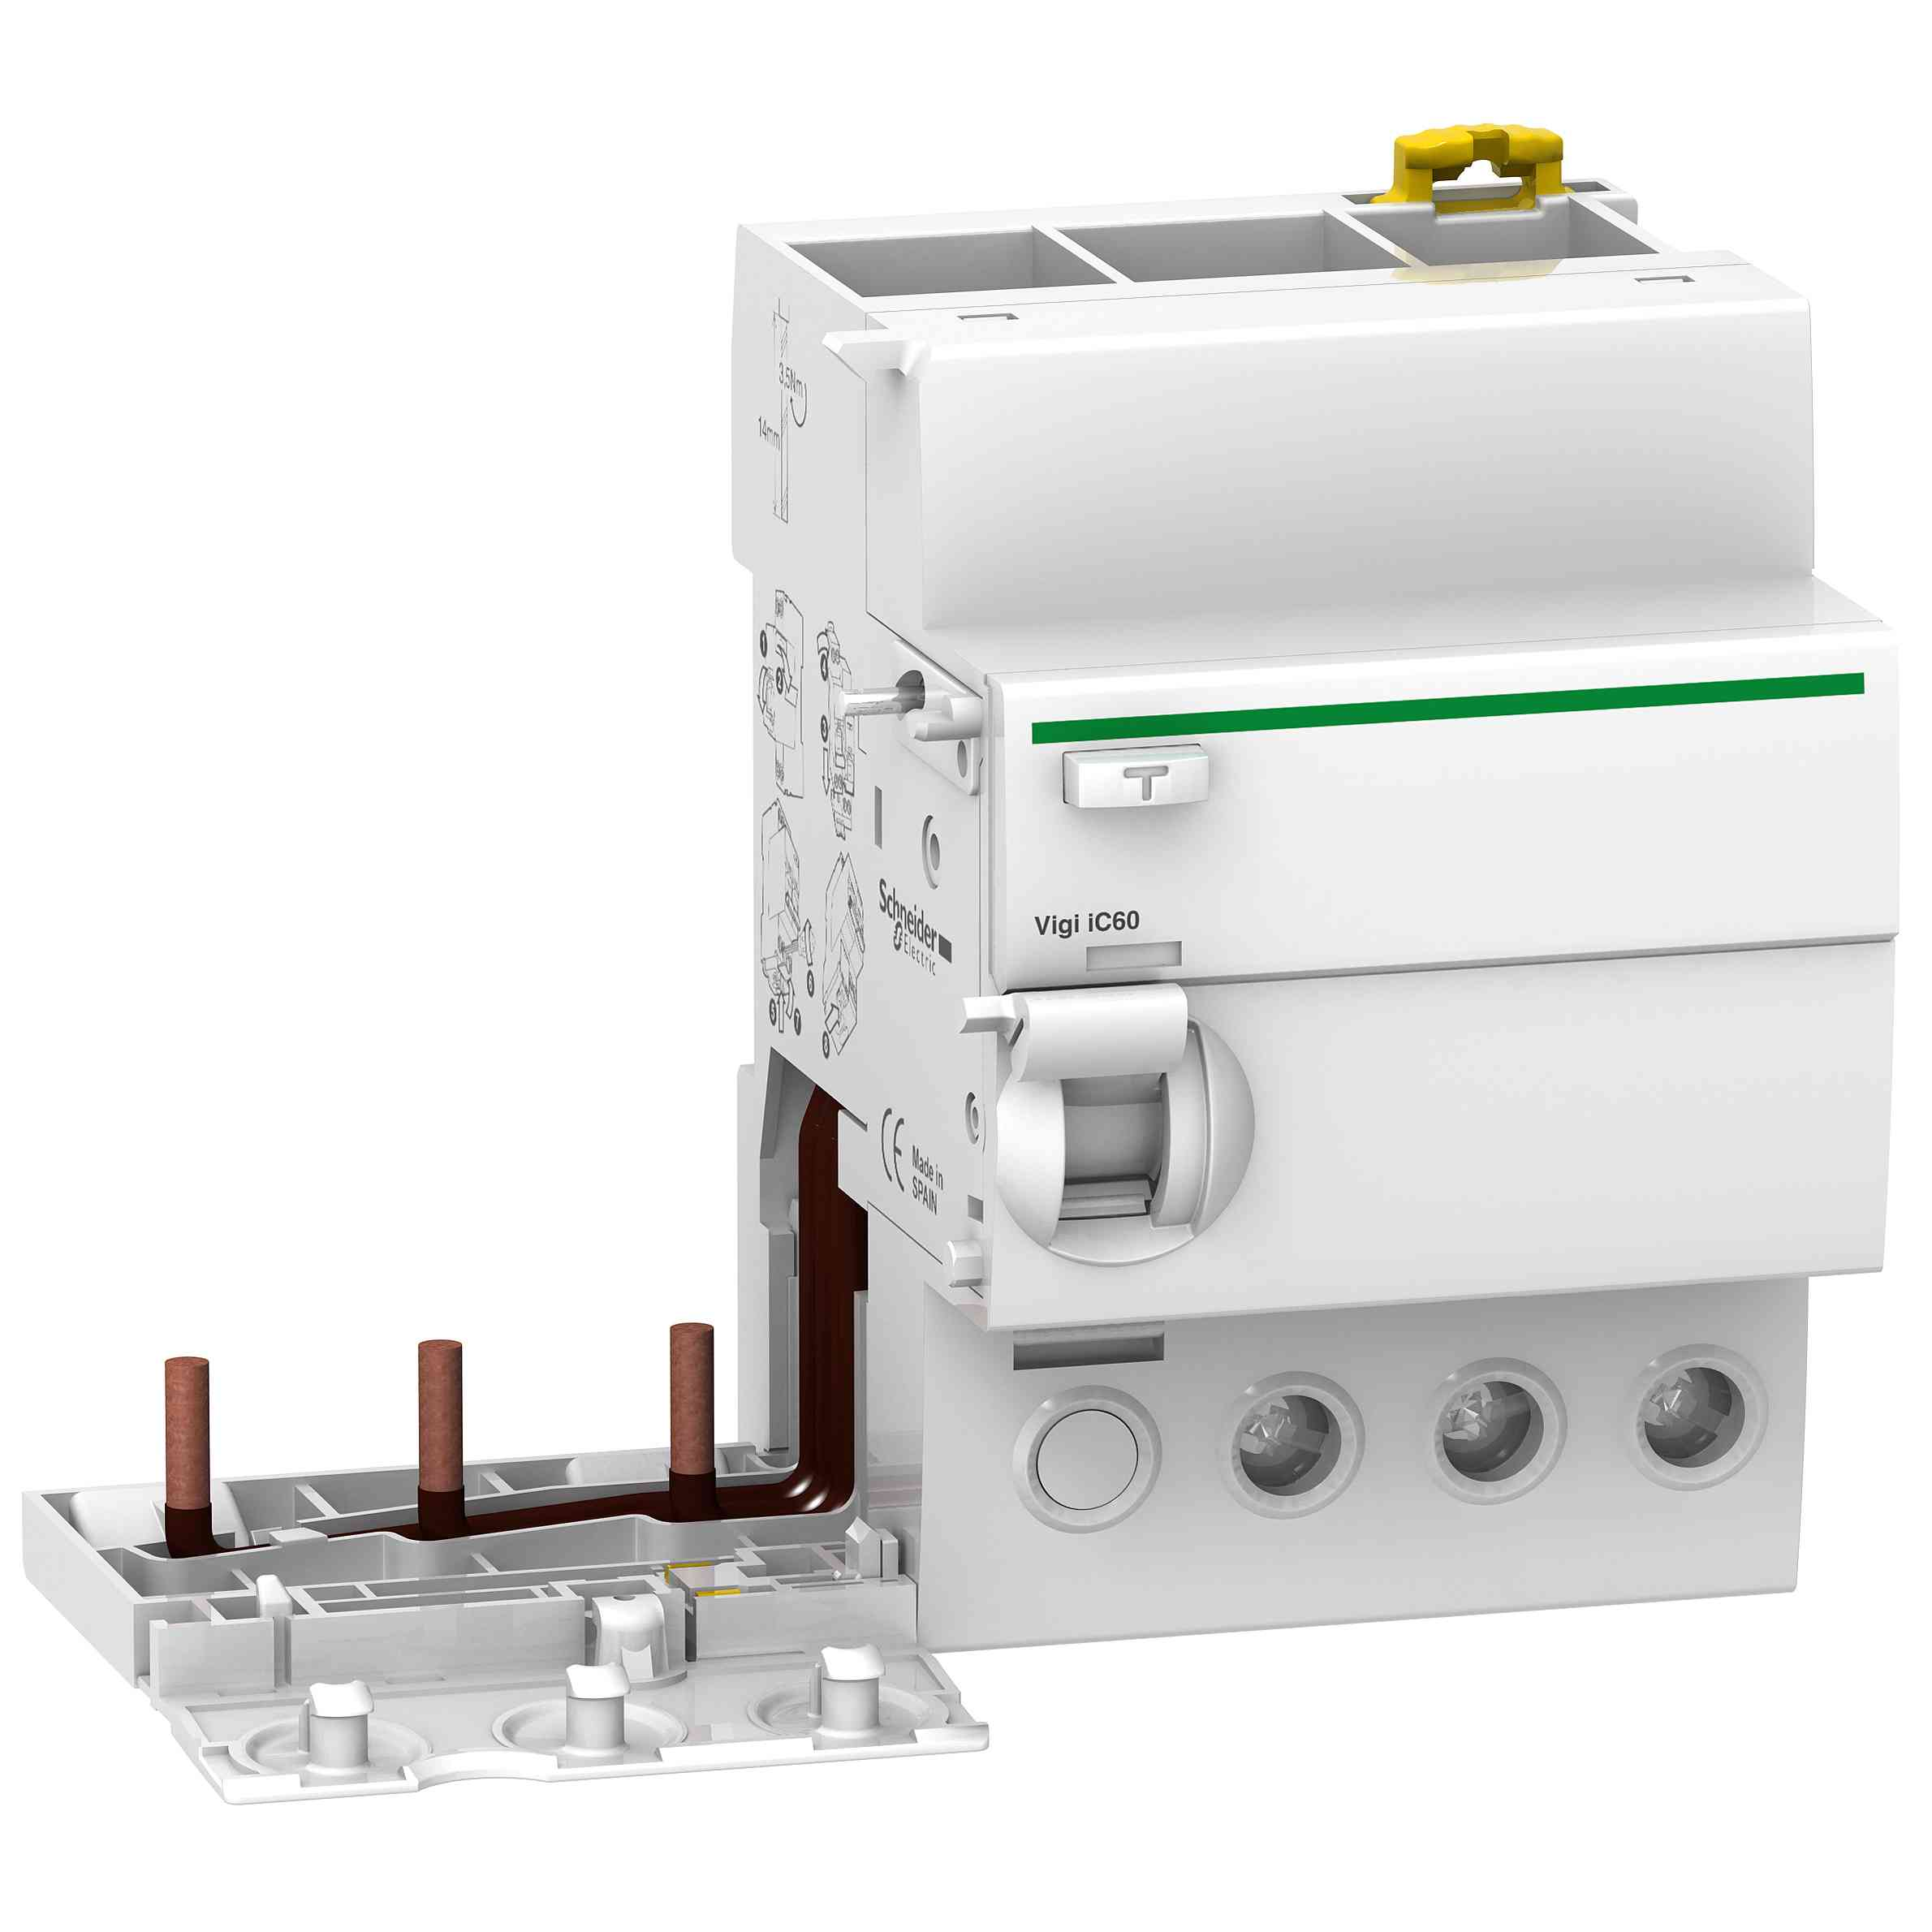 Vigi iC60 - ozemljitveni blok - 3P - 63 A - 500 mA - tip A